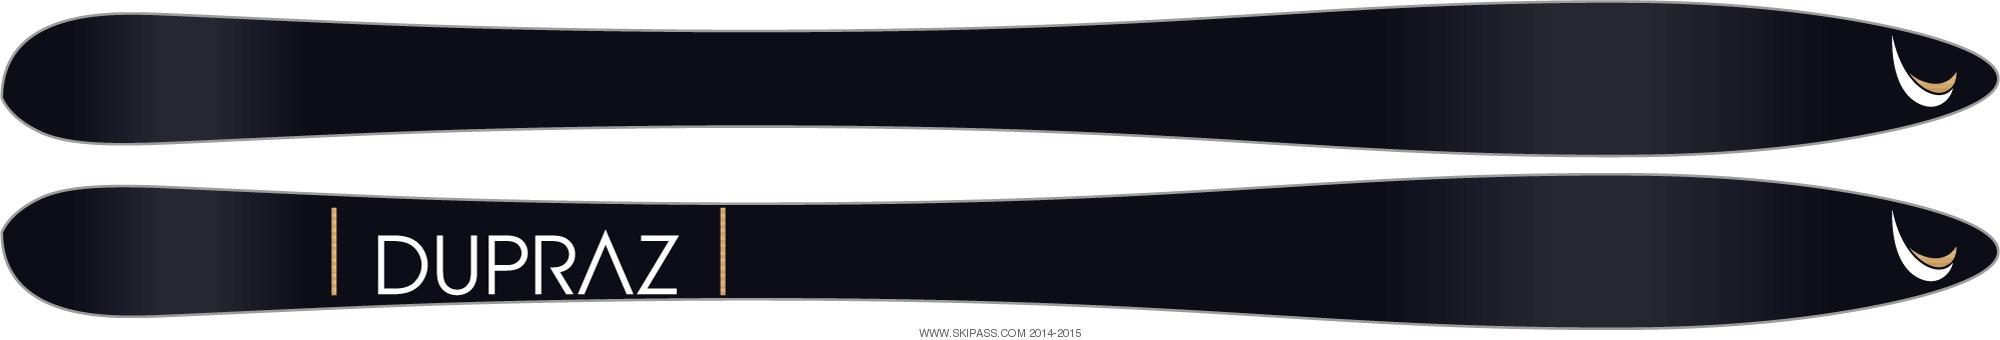 Dupraz S series